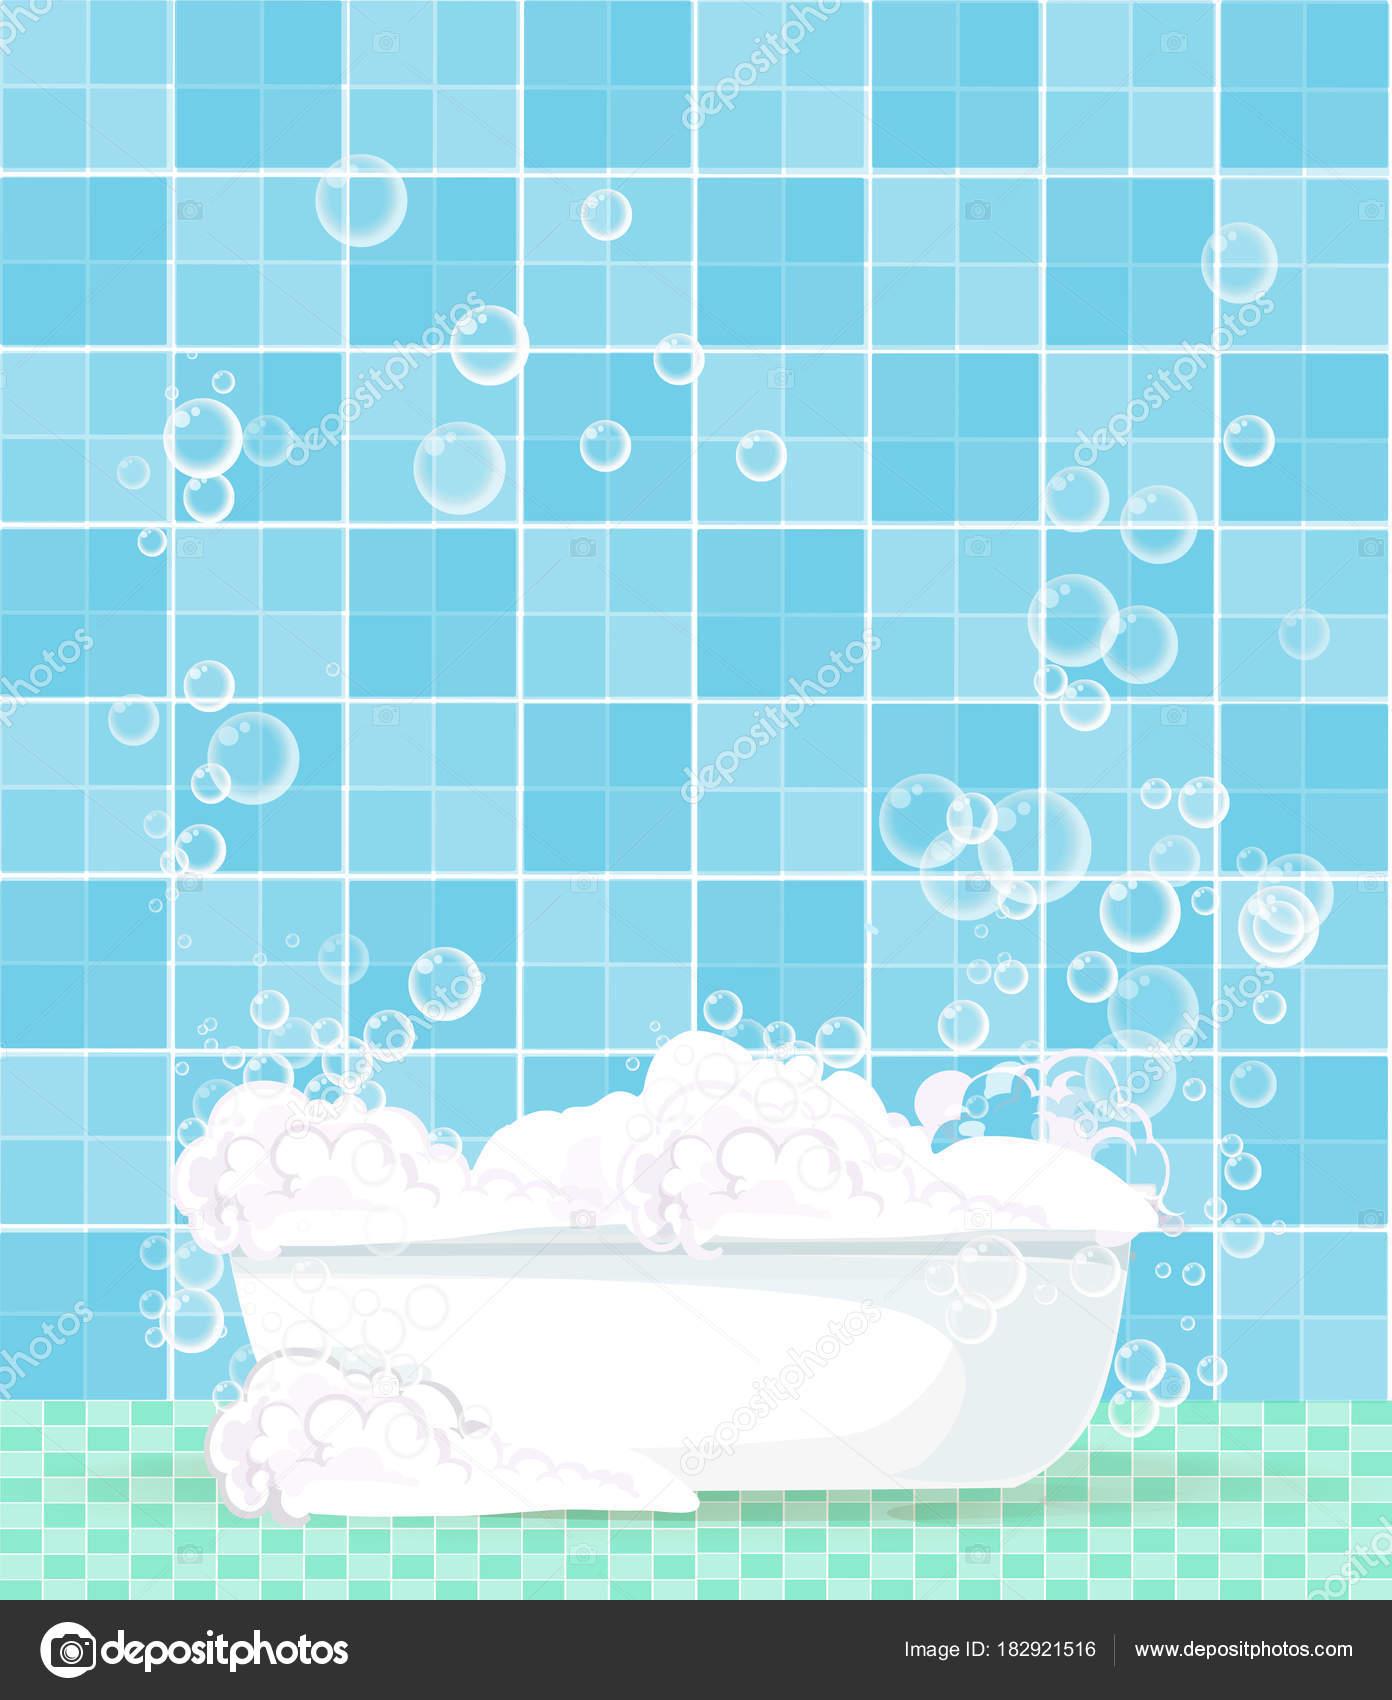 bathtub full of foam with floating soap bubbles 0n blue tiles ...